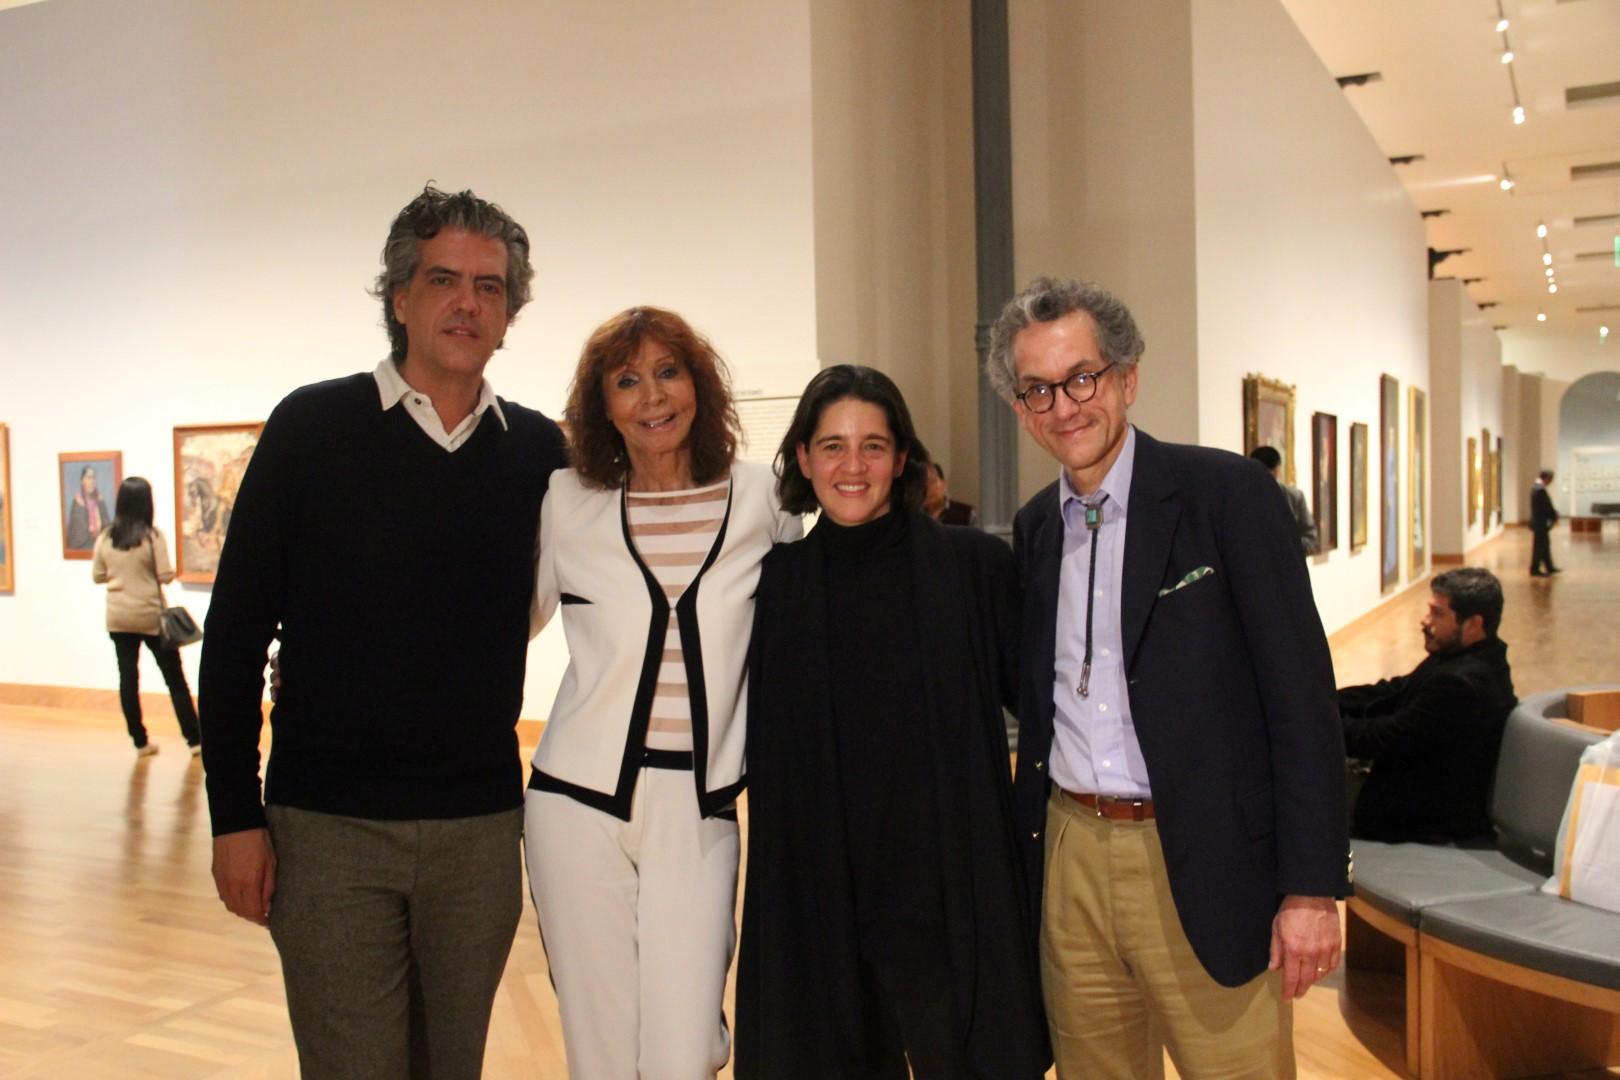 Paulo Dam, Kristin Feireiss, ganadora Mariana Leguía y Guy Nordenson